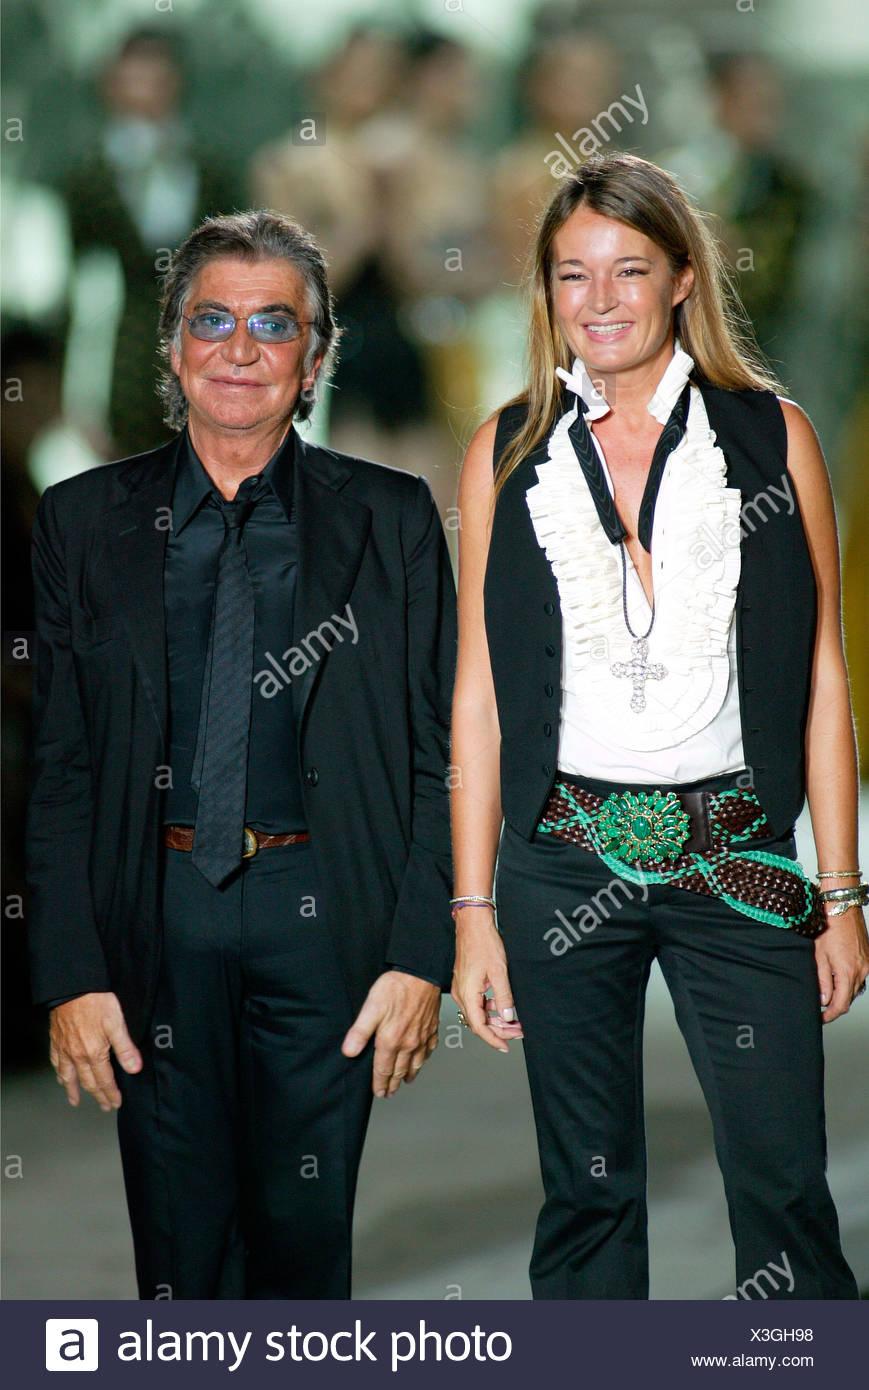 2661568b1 Roberto Cavalli Milan Ready to Wear Spring Summer Fashion design couple Roberto  Cavalli and wife, Eva Cavalli